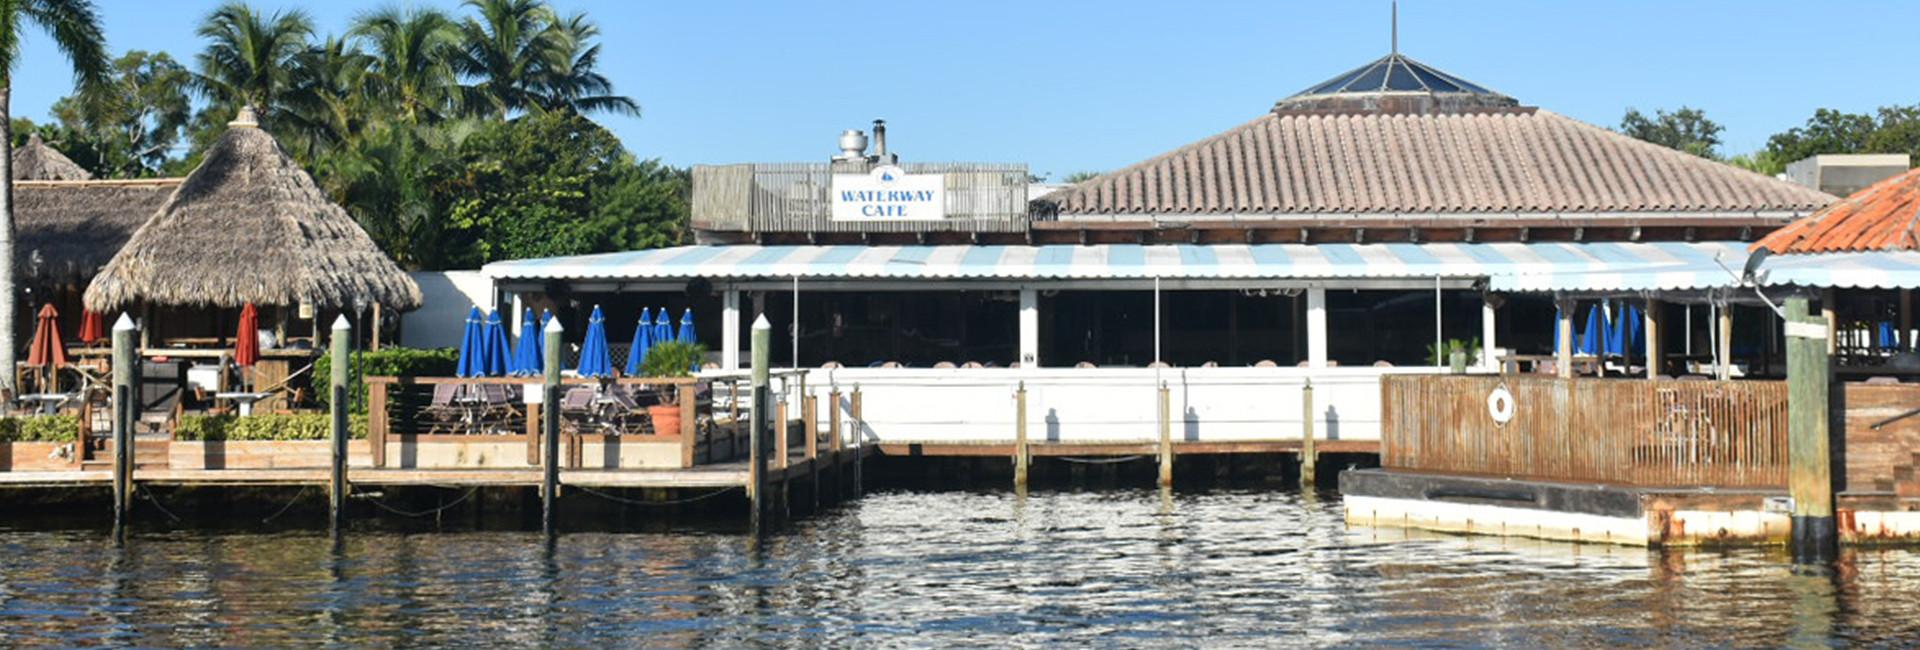 Water Way Cafe Restaurant